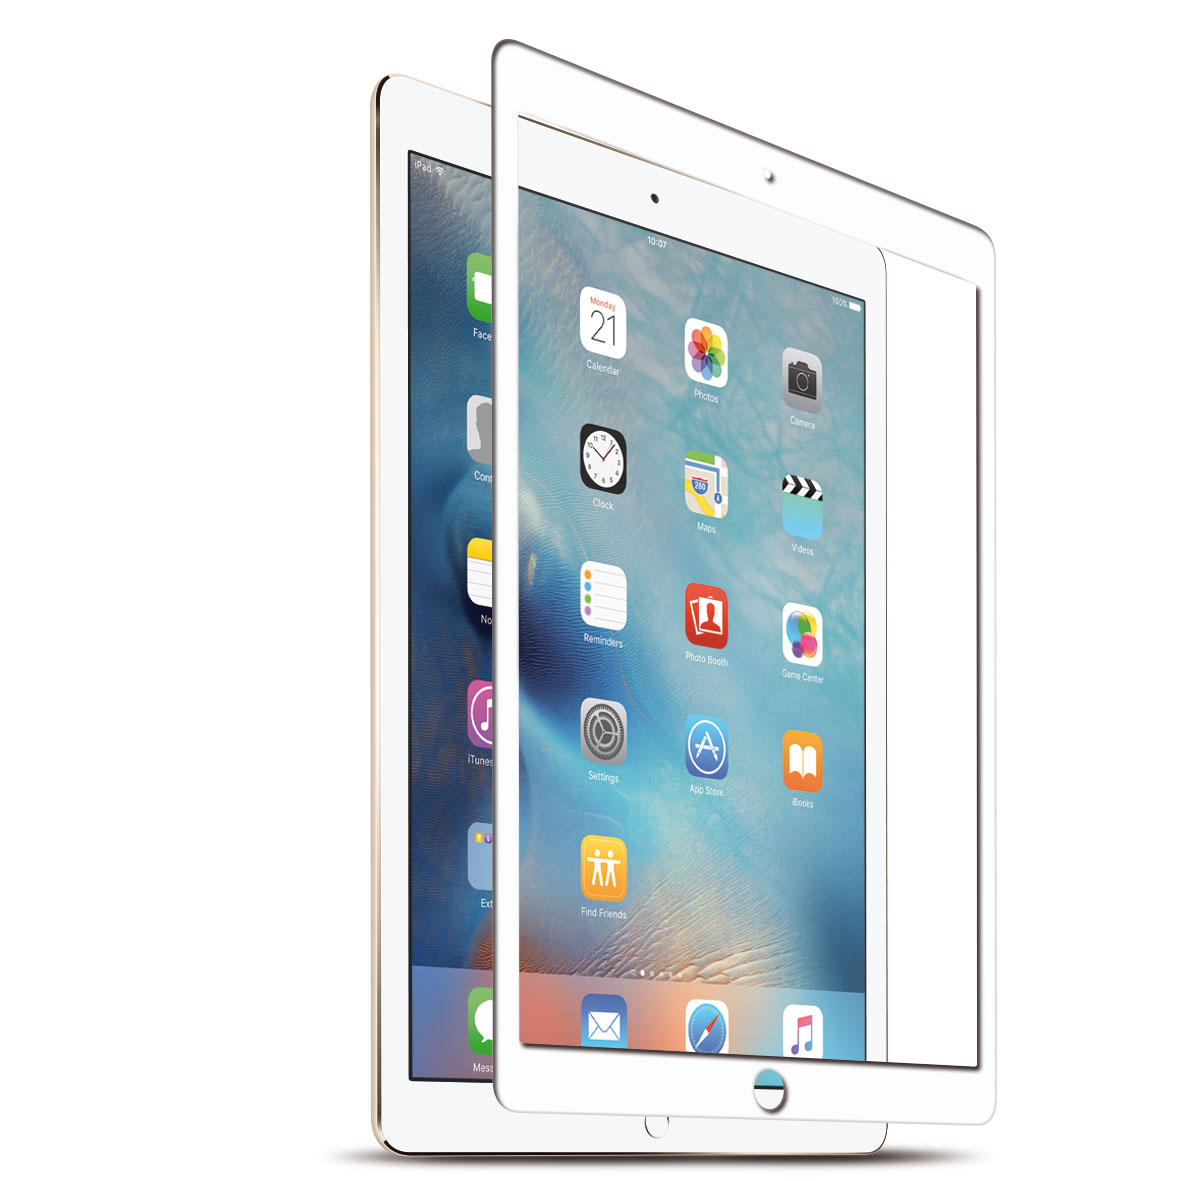 KMP Protective Glass Schutzfolie für iPad Mini 4, weiß